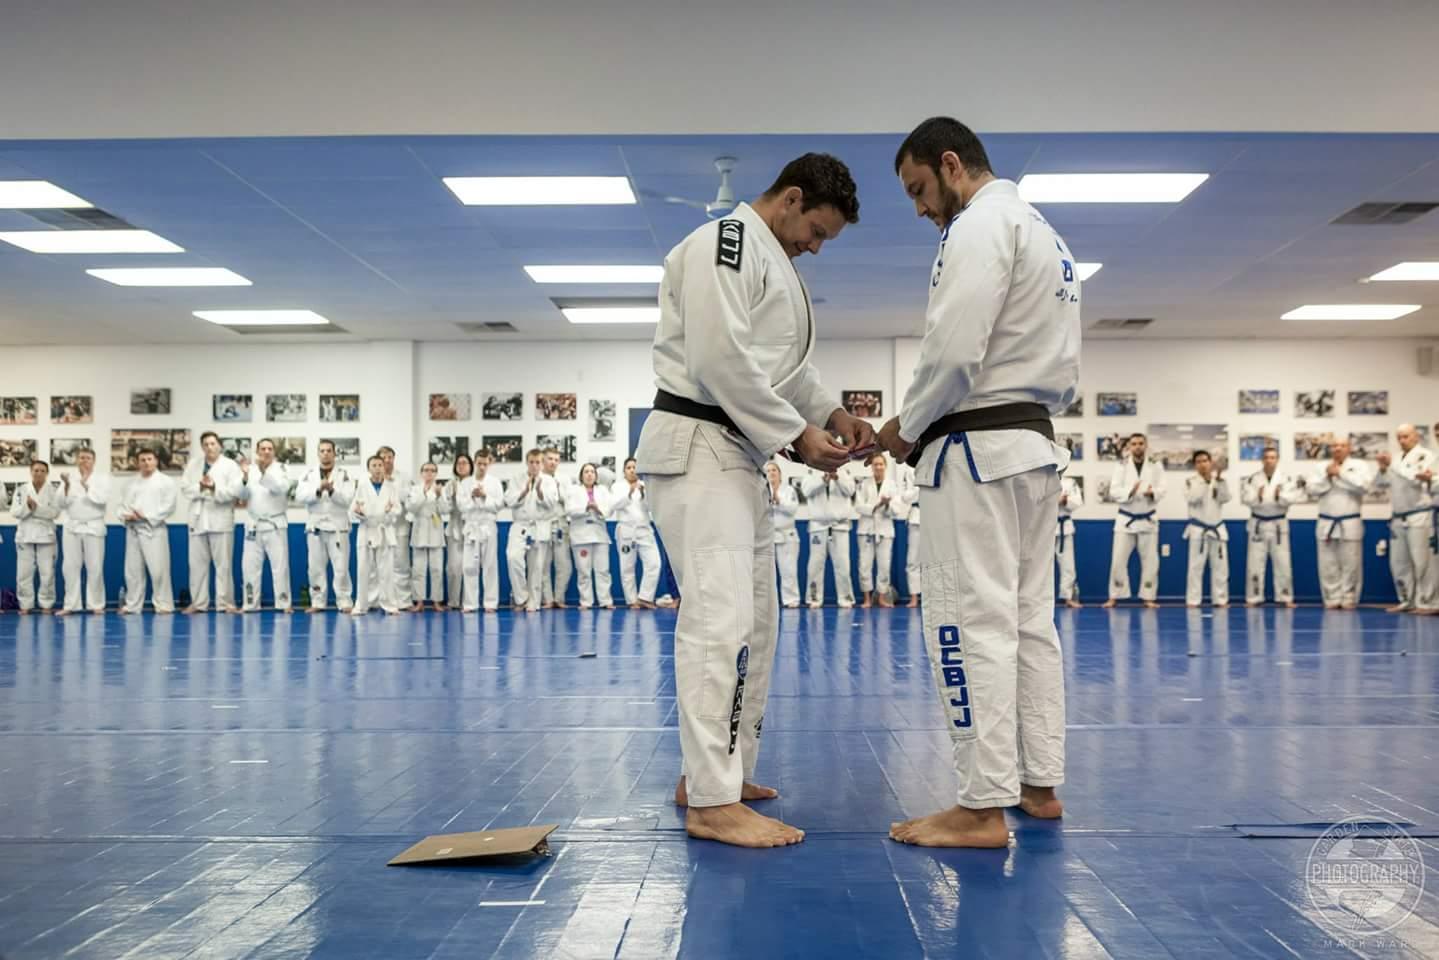 Tom Deblass On Why So Many Quit Before Getting A BJJ Black Belt